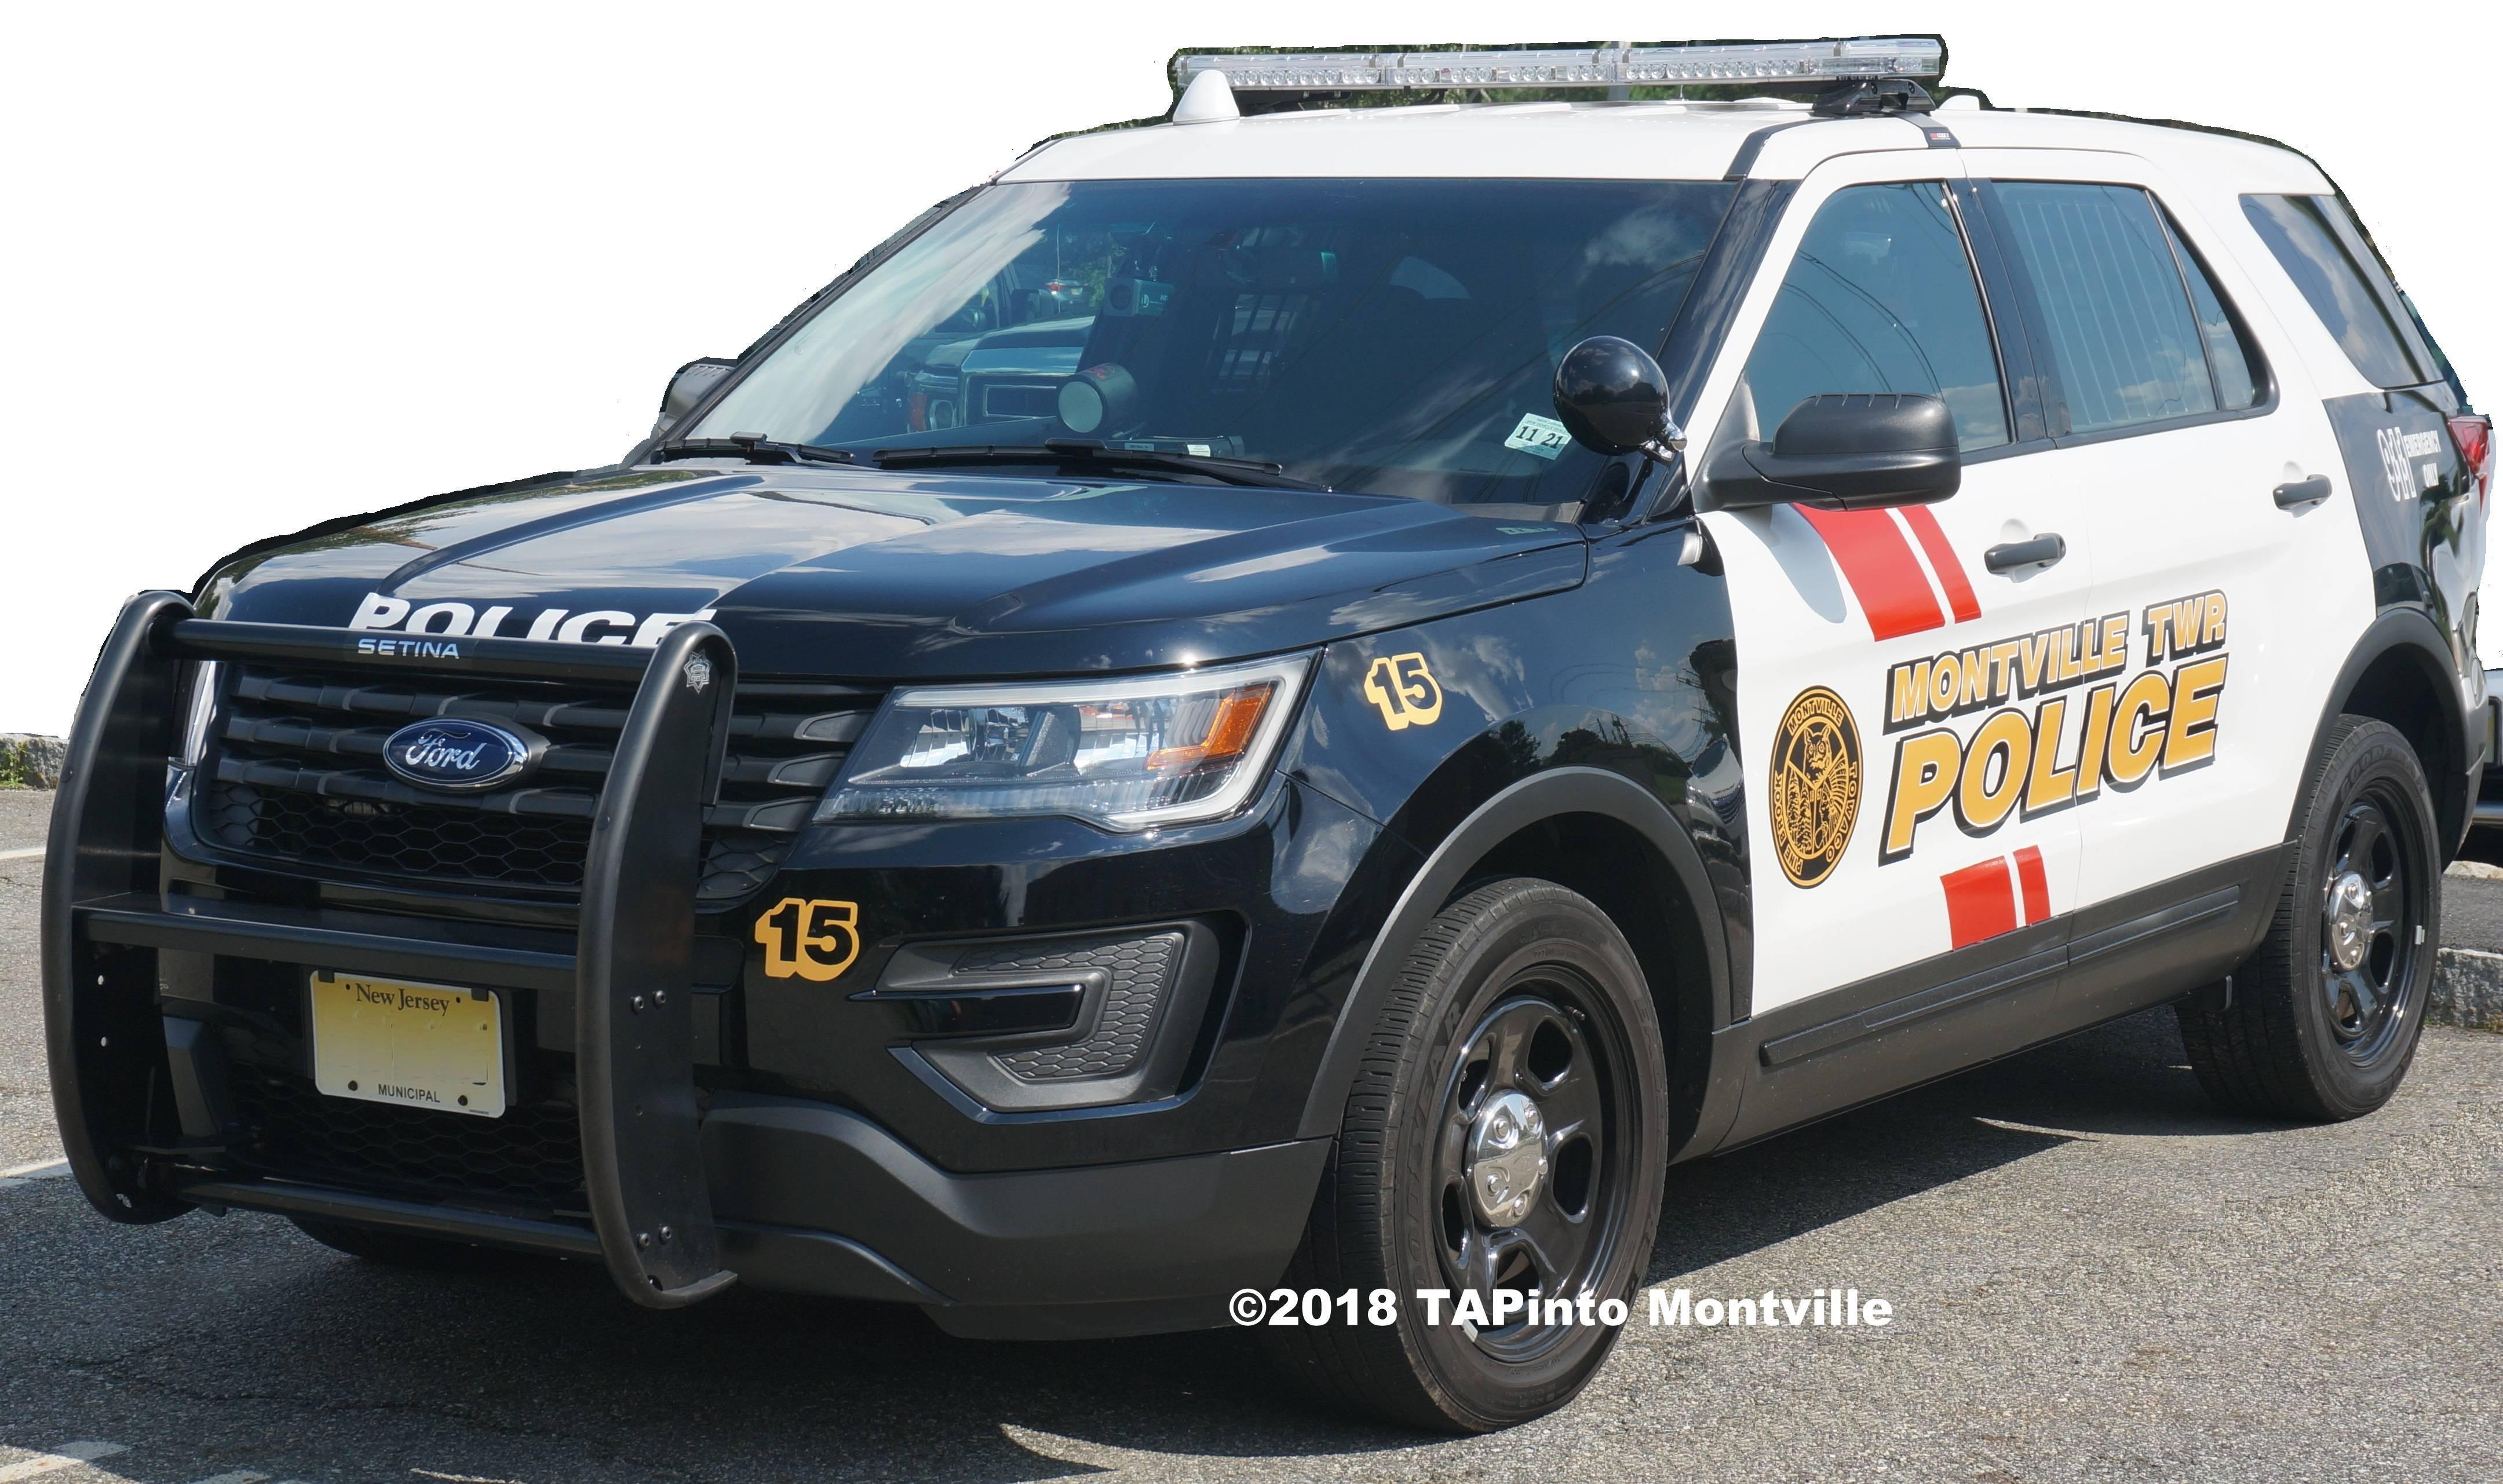 850d2b837518345484d9_a_Police_SUV__2018_TAPInto_Montville___1..jpg